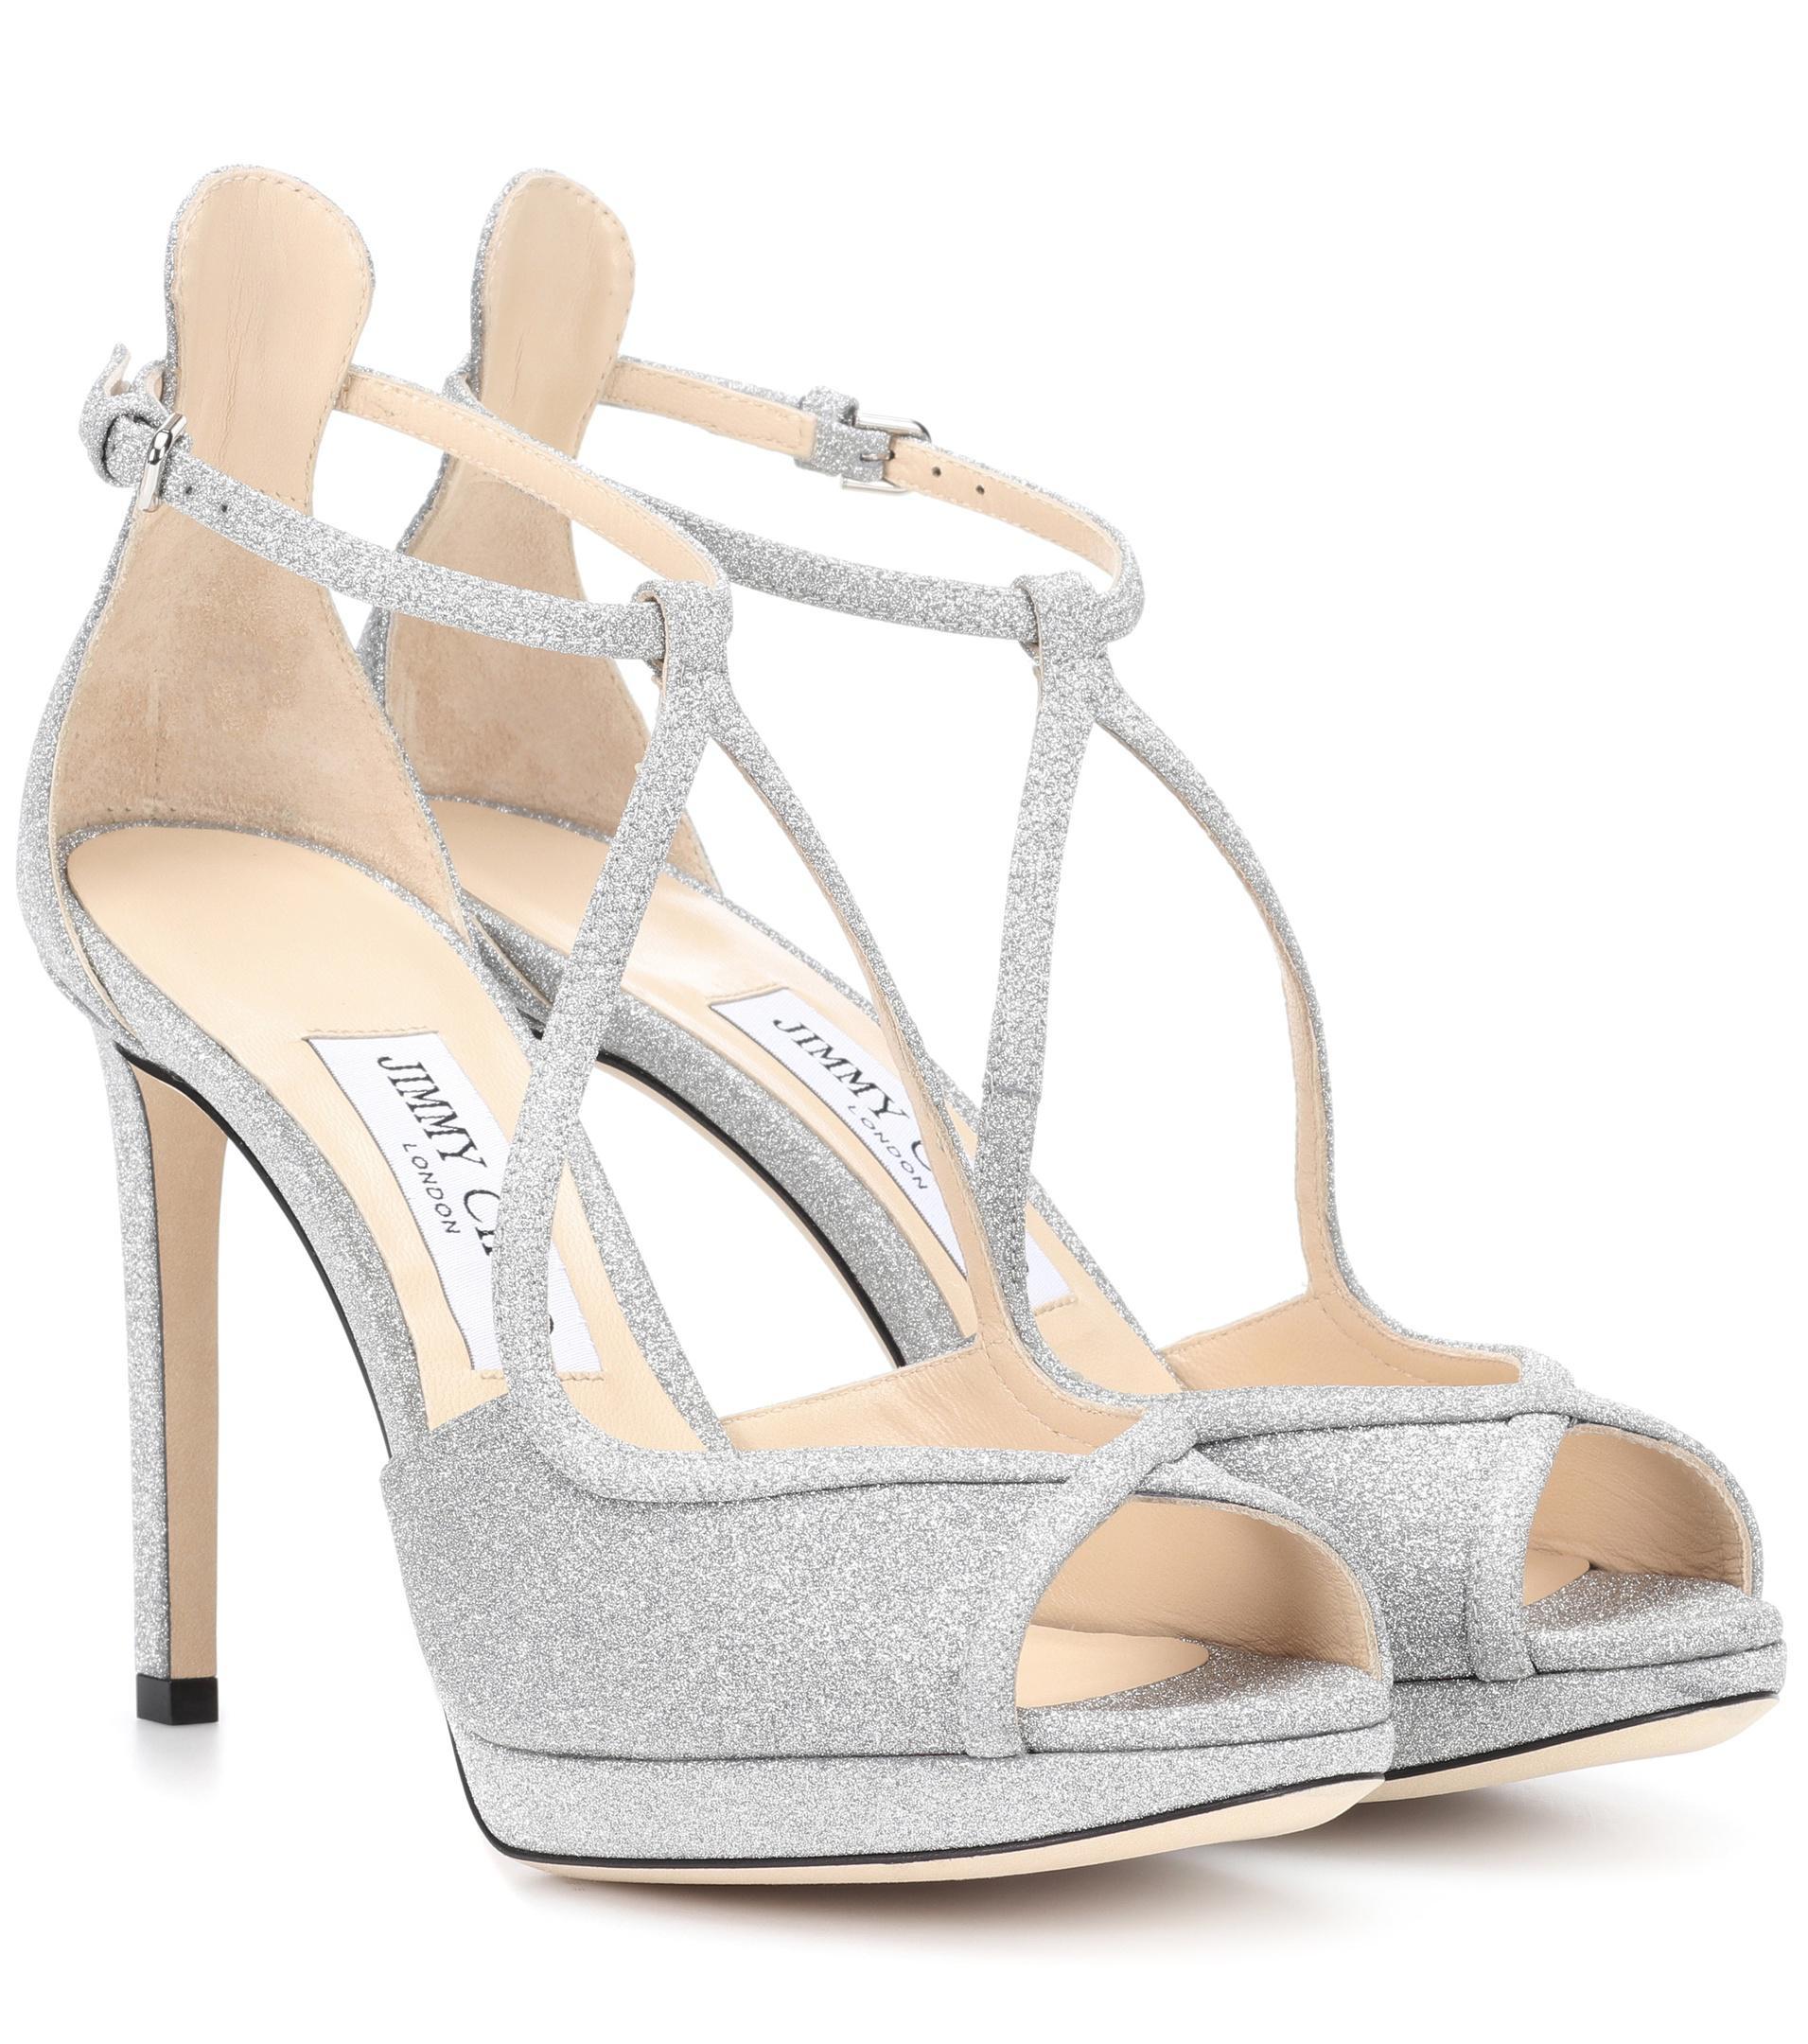 389c975e2ae Lyst - Jimmy Choo Fawne 100 Glitter Sandals in Metallic